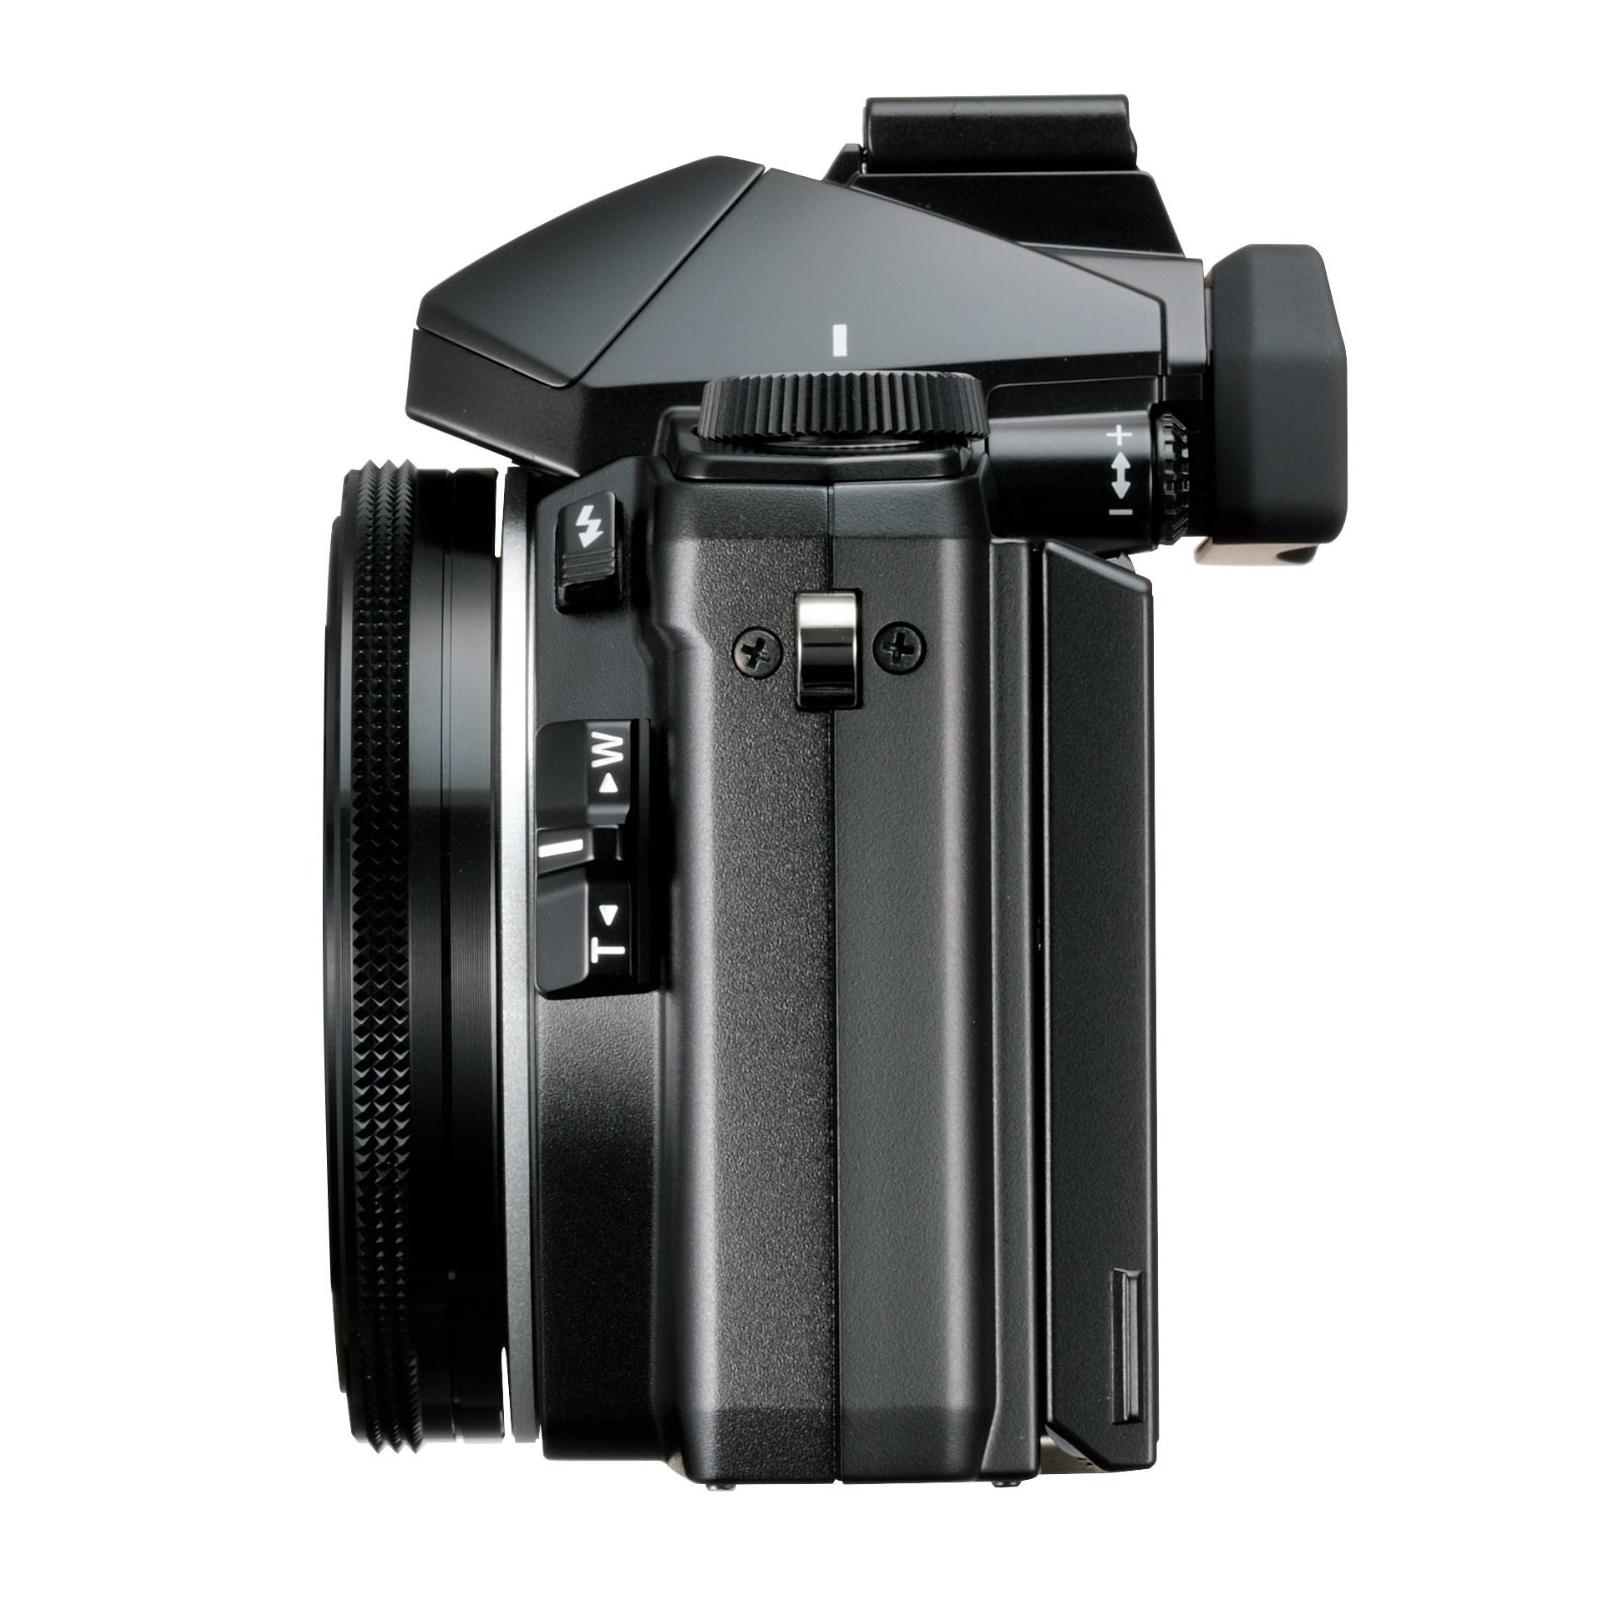 Цифровой фотоаппарат OLYMPUS STYLUS 1 Black (V109010BE000) изображение 10